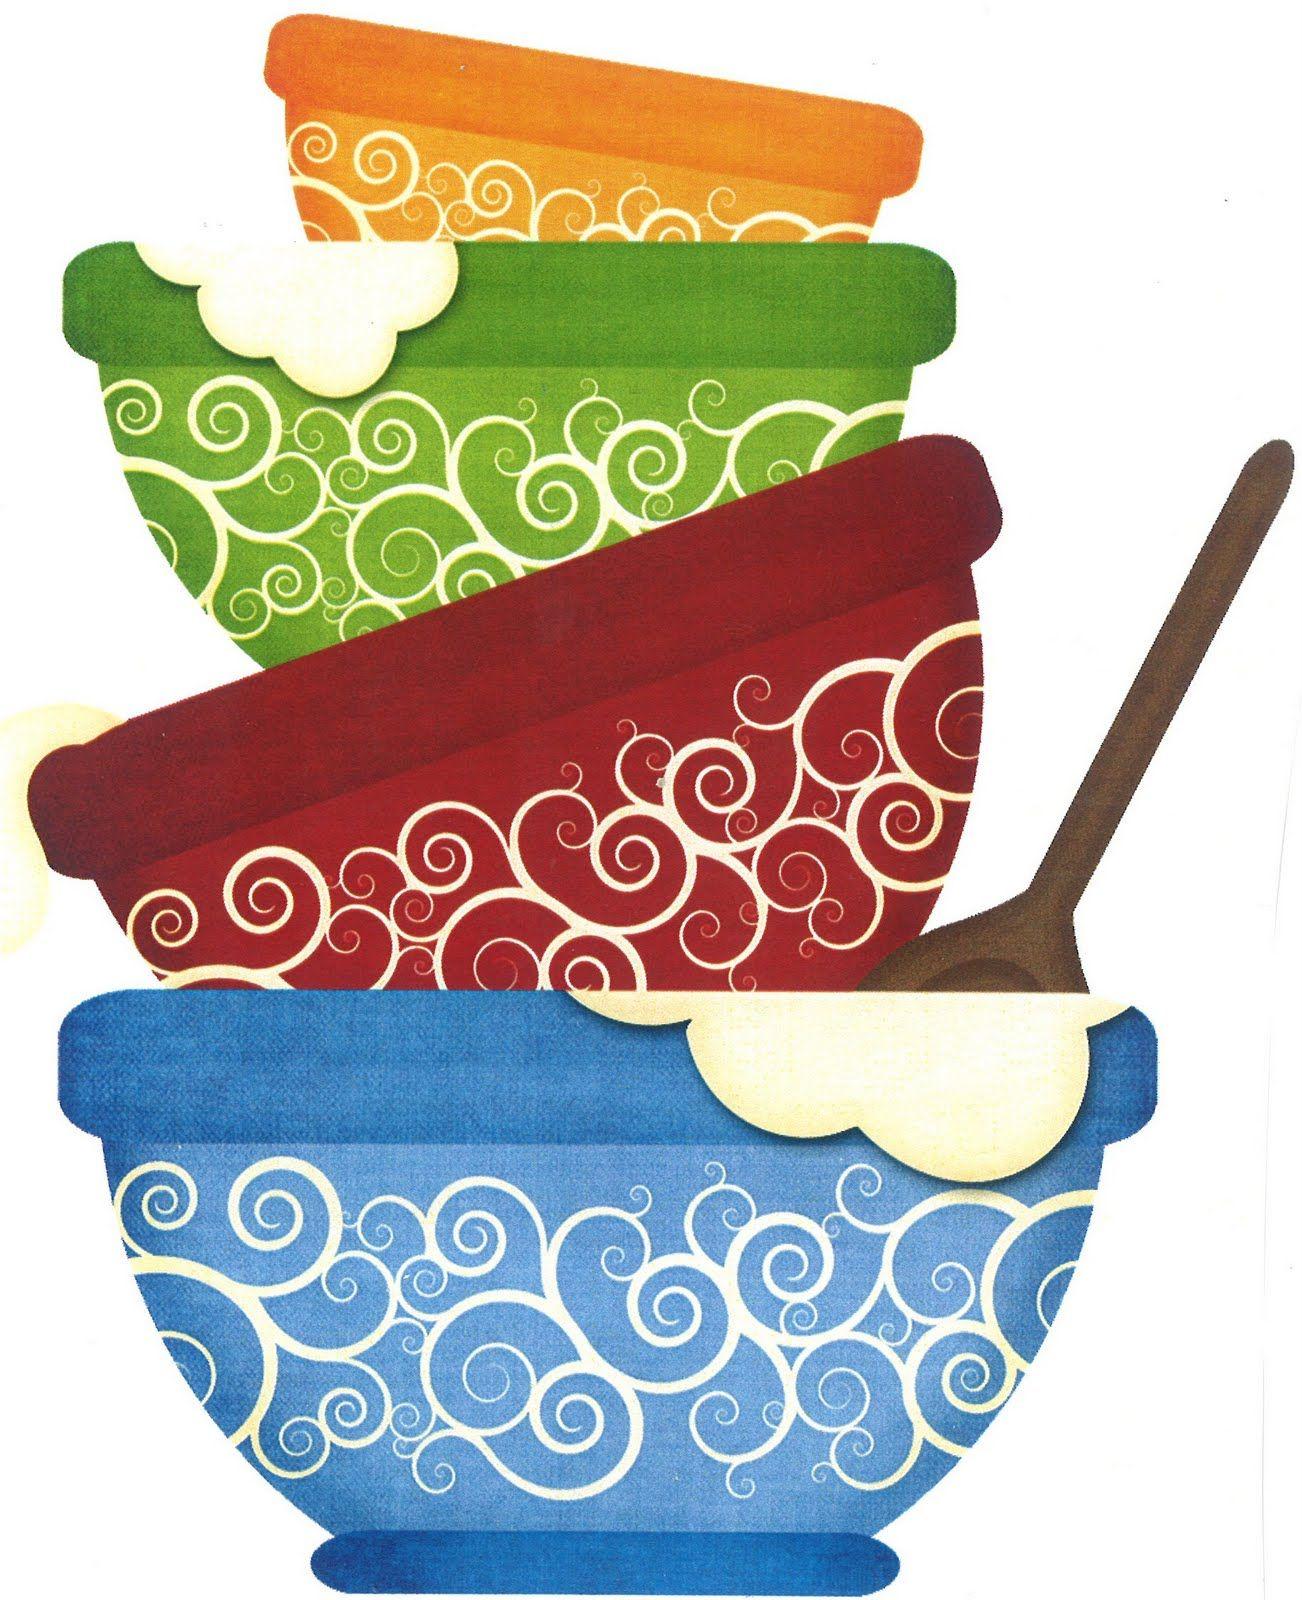 Cookbook Clipart : cookbook, clipart, Decoupage, Recipe, Scrapbook, Book,